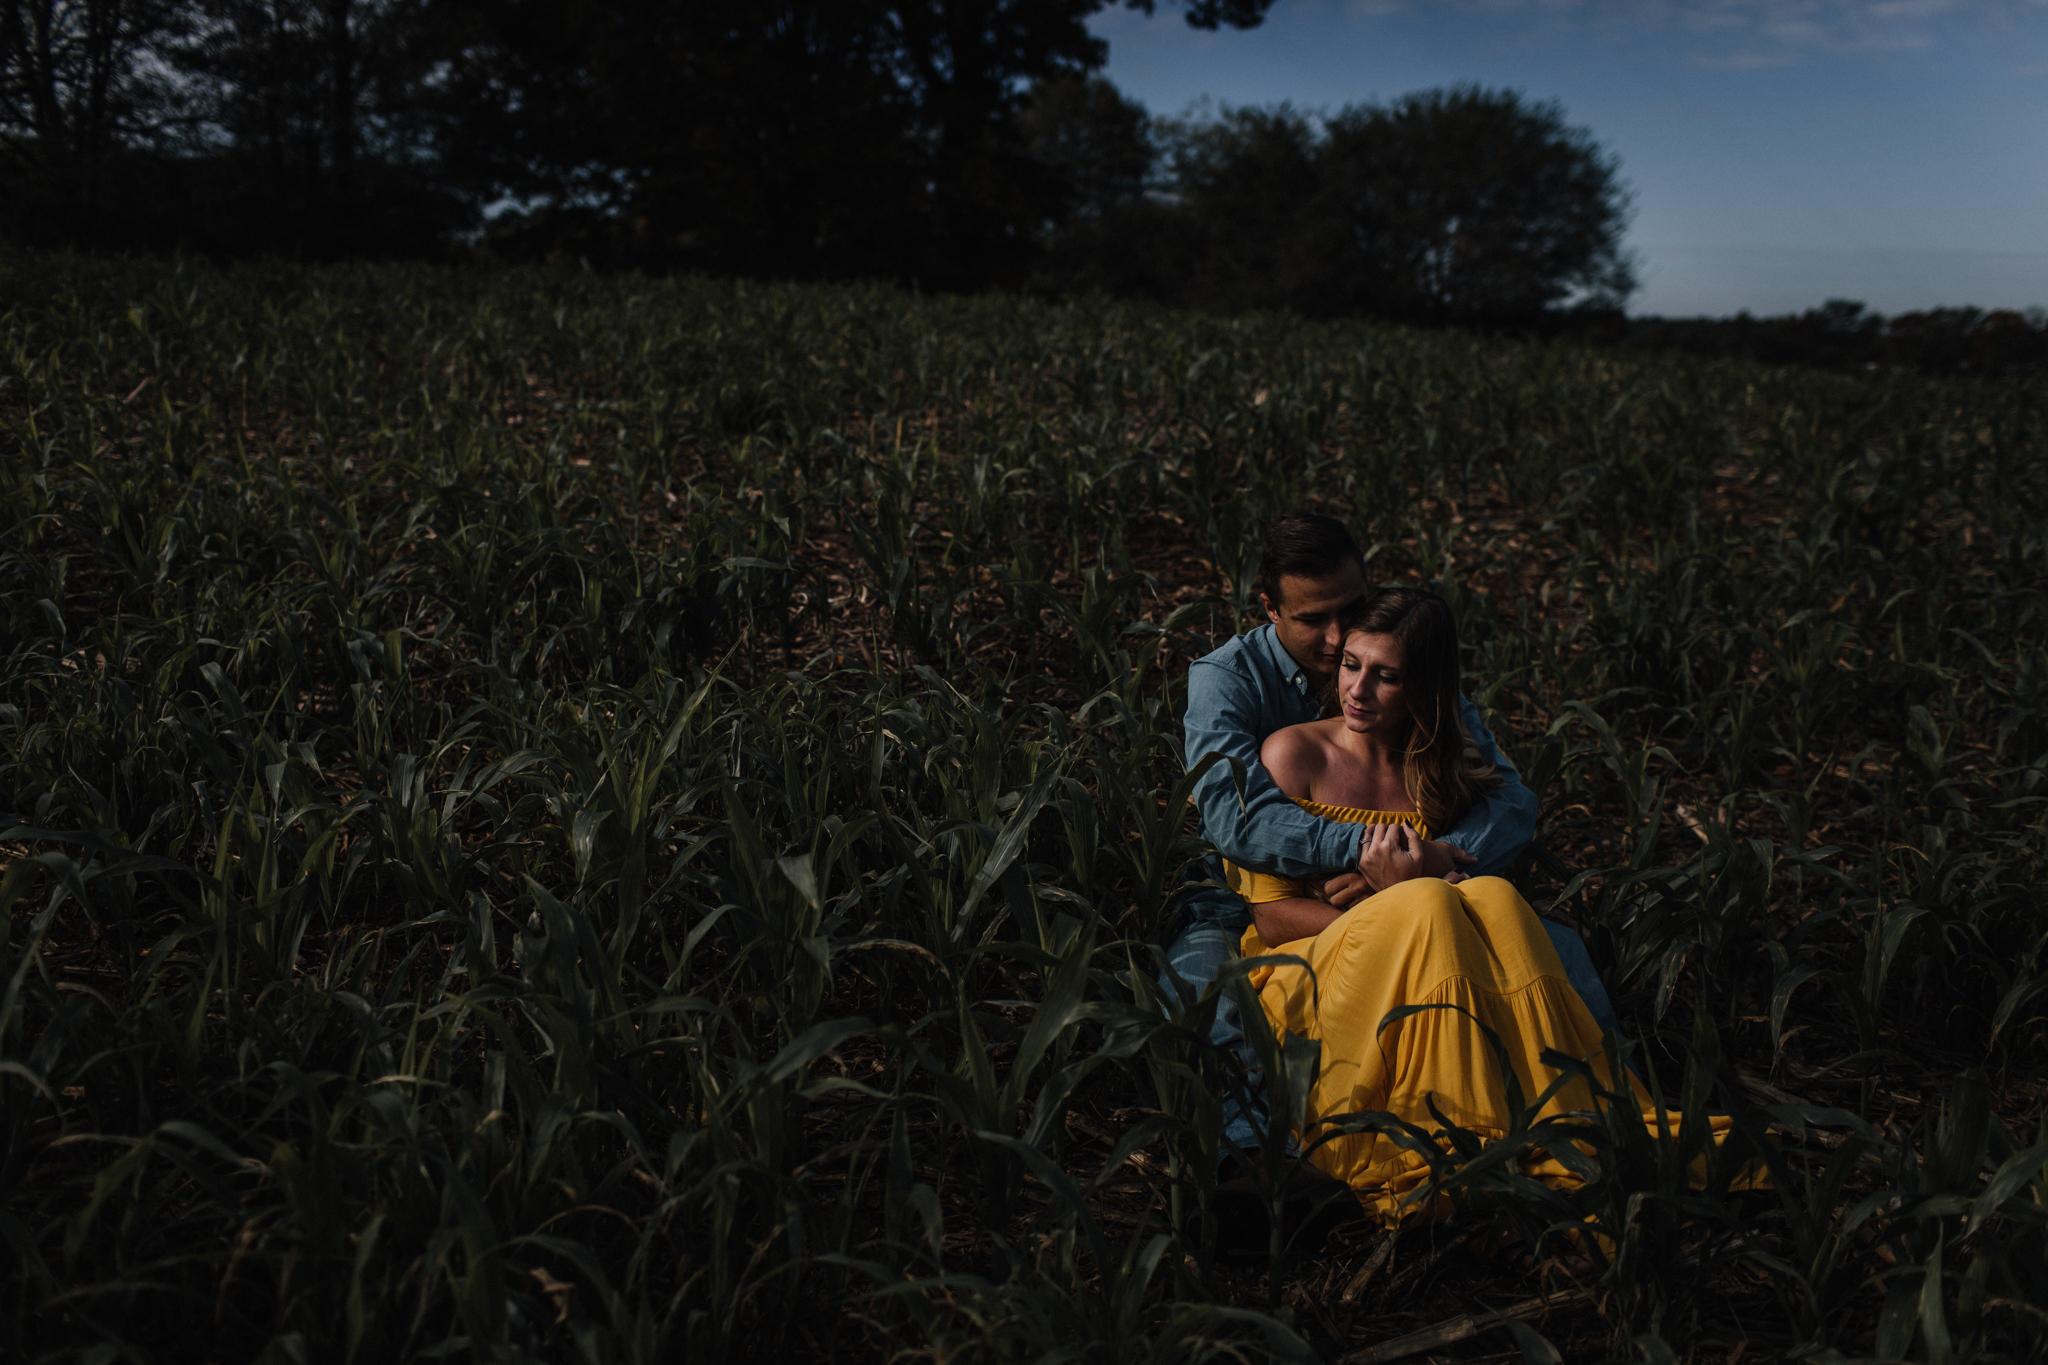 billie-shaye-style-photography-www.billieshayestyle.com-harsh-light-couples-session-nashville-tennessee-7156.jpg